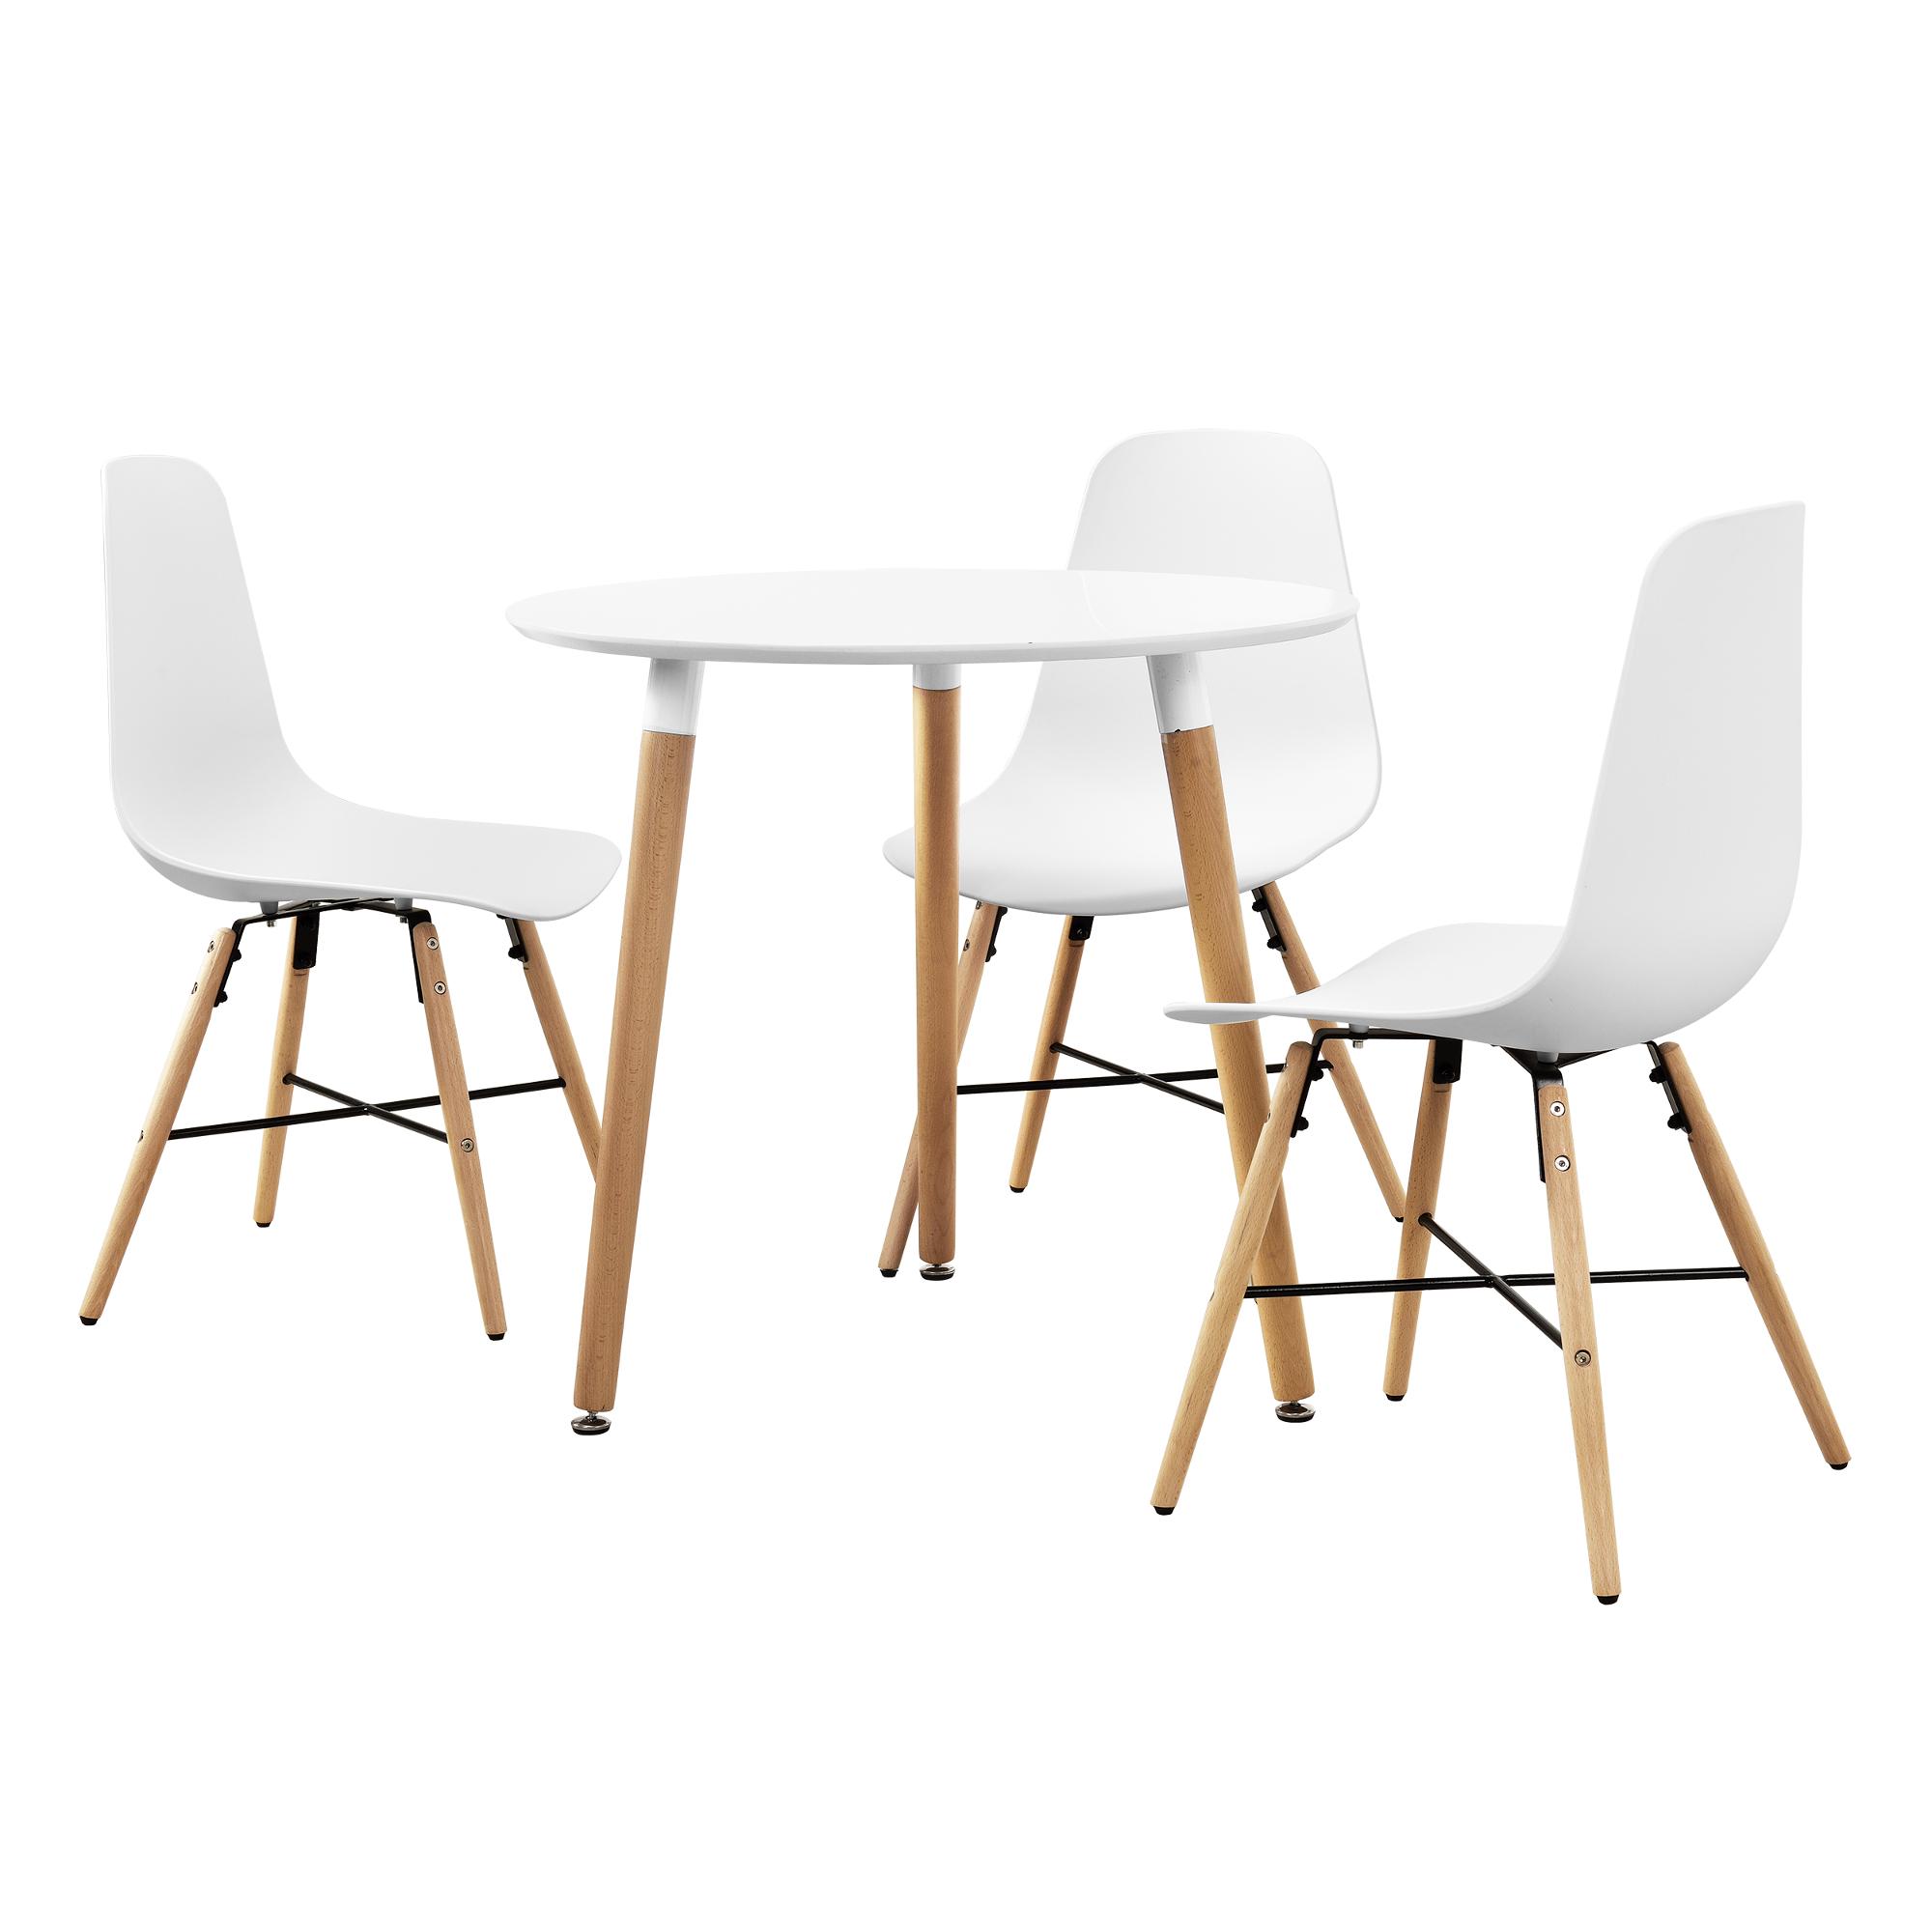 table de salle manger blanc mit 3 chaises 80cm set ebay. Black Bedroom Furniture Sets. Home Design Ideas